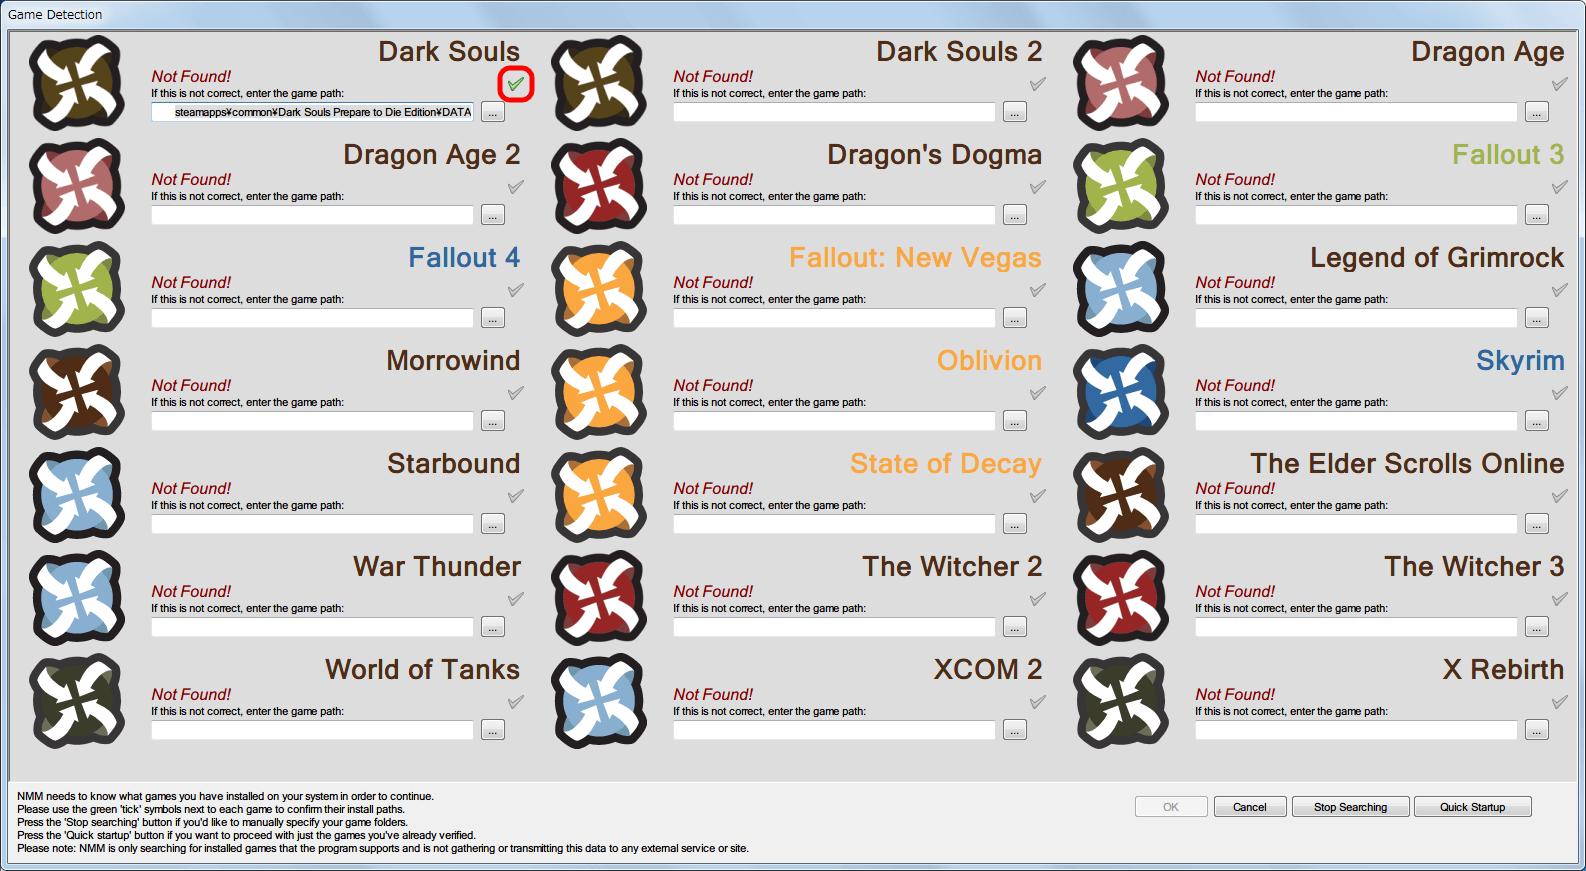 Dark Souls がインストールされているフォルダパス名を手動で入力または選択。間違いがなければ緑のチェックマークが表示、パス名は Steam 版のものだが GfWL 版でも可能